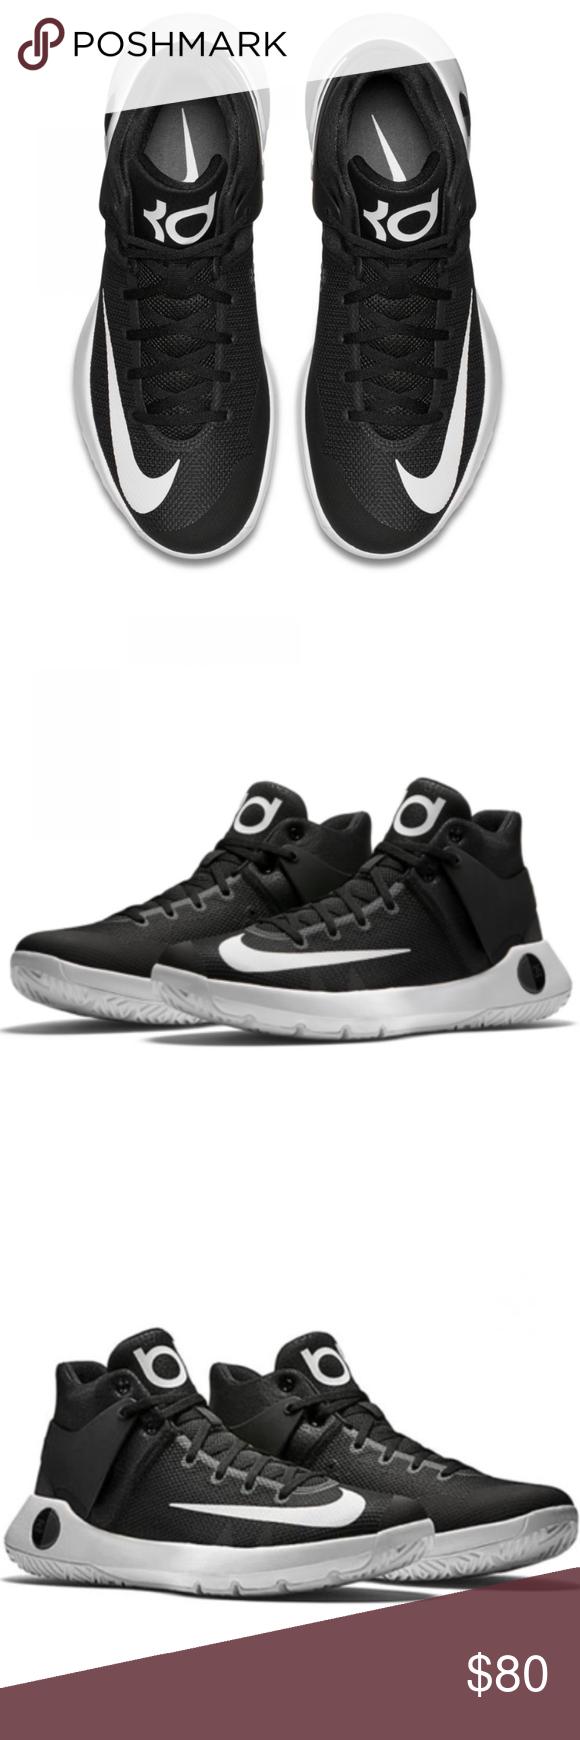 Kevin Durant KD TREY 5 IV Men\u0027s Basketball Shoes NWT